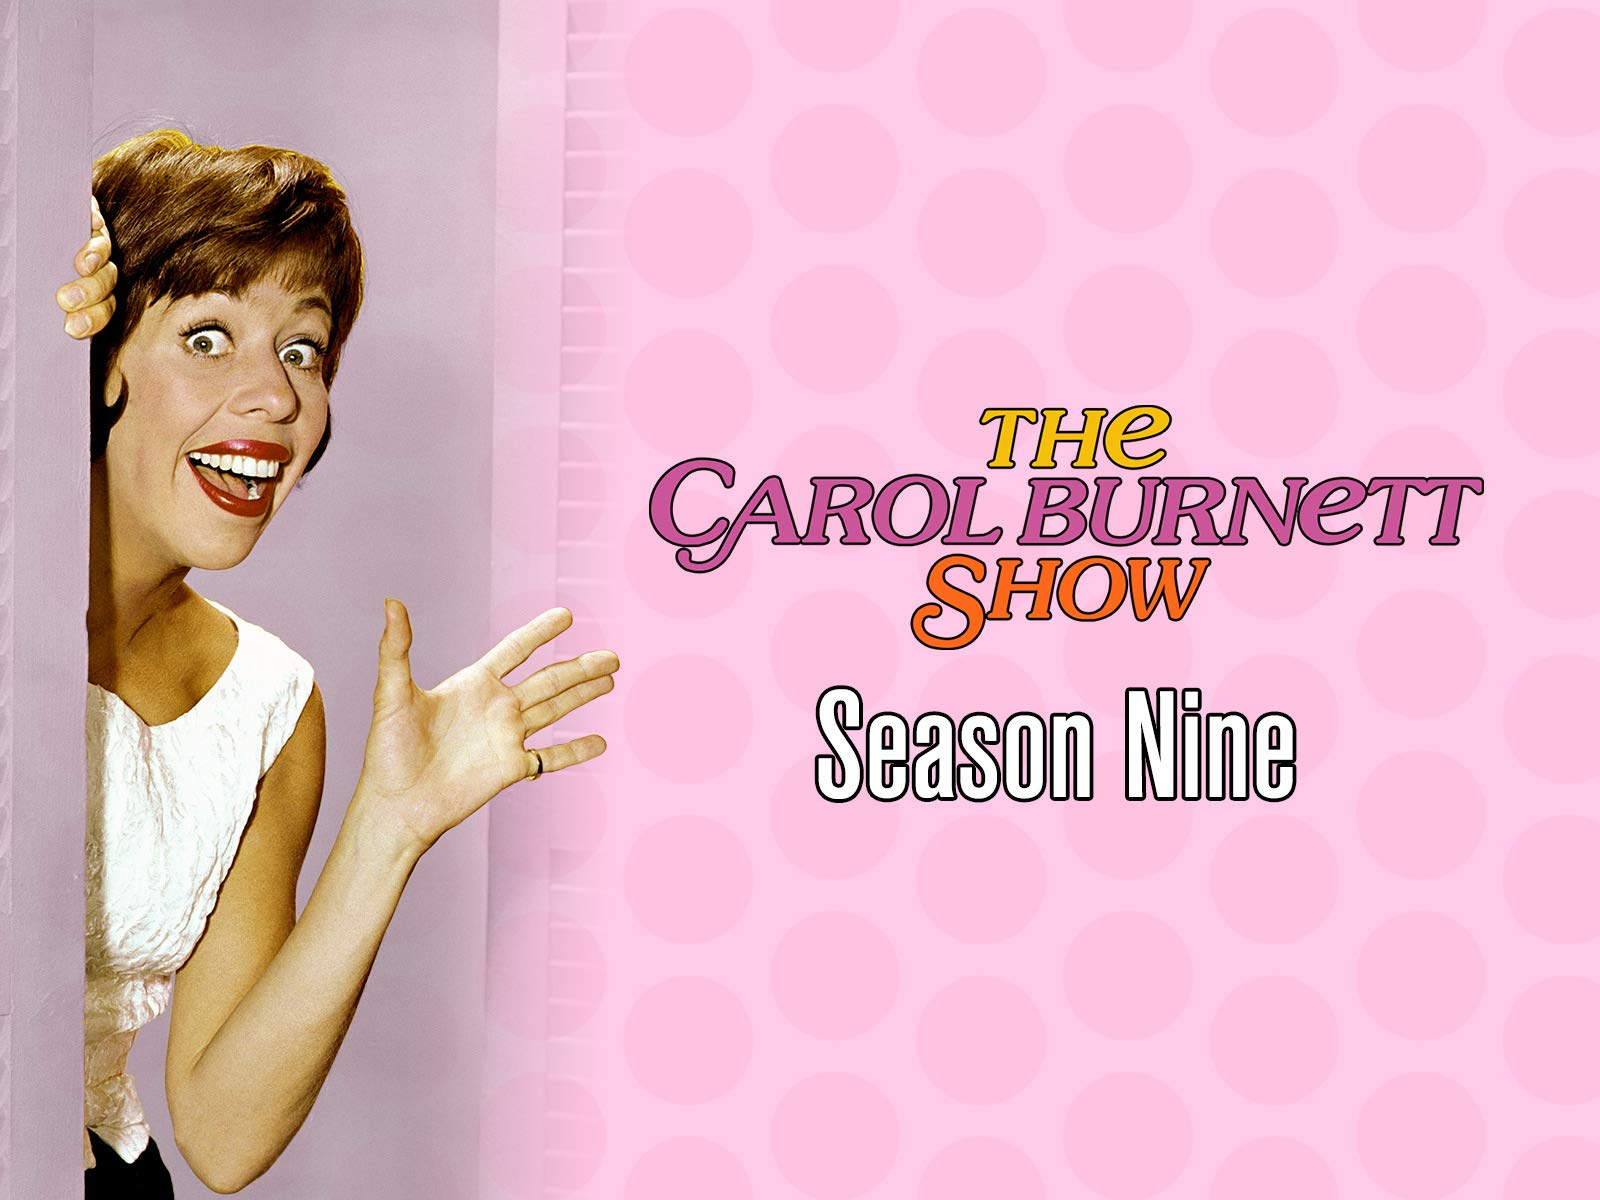 The Carol Burnett Show - Season 9